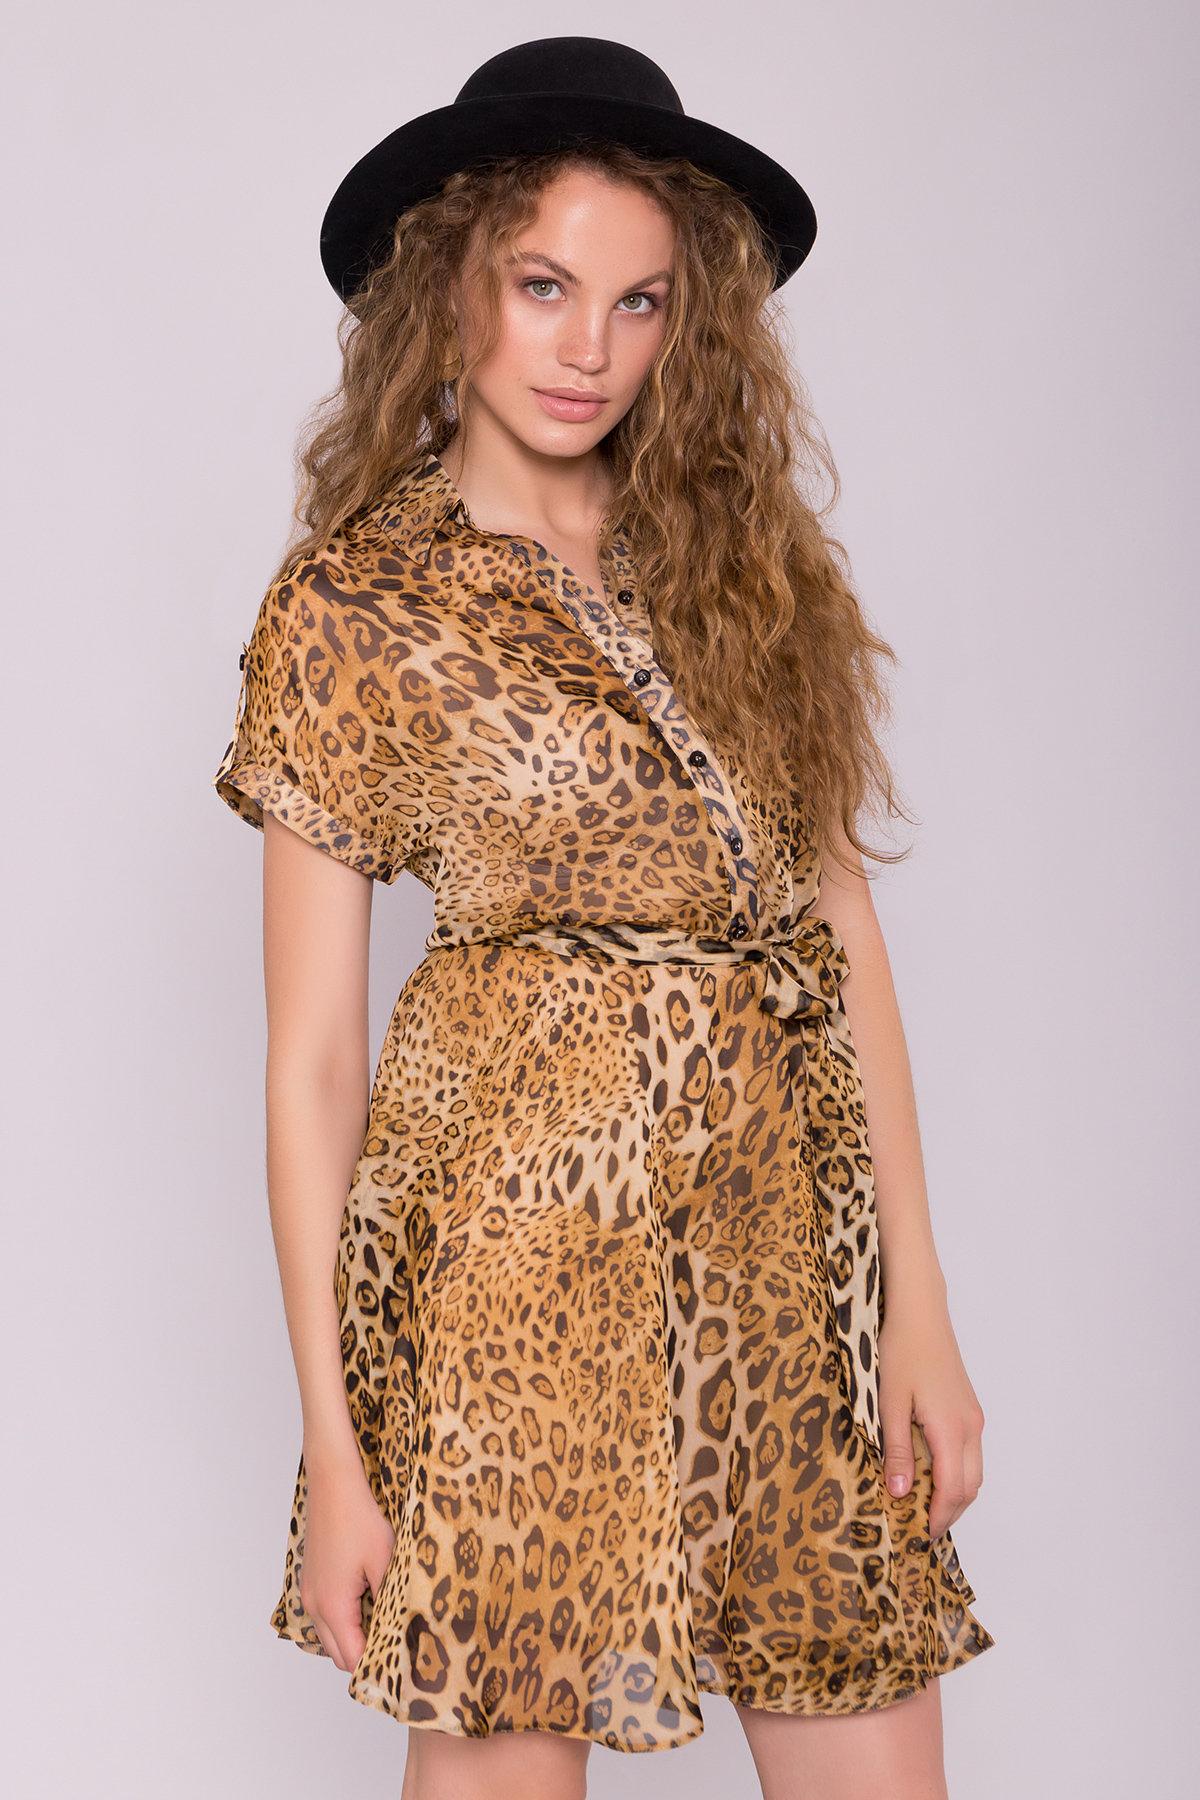 Платье Санжар 6935 АРТ. 42936 Цвет: Леопард 2 - фото 3, интернет магазин tm-modus.ru